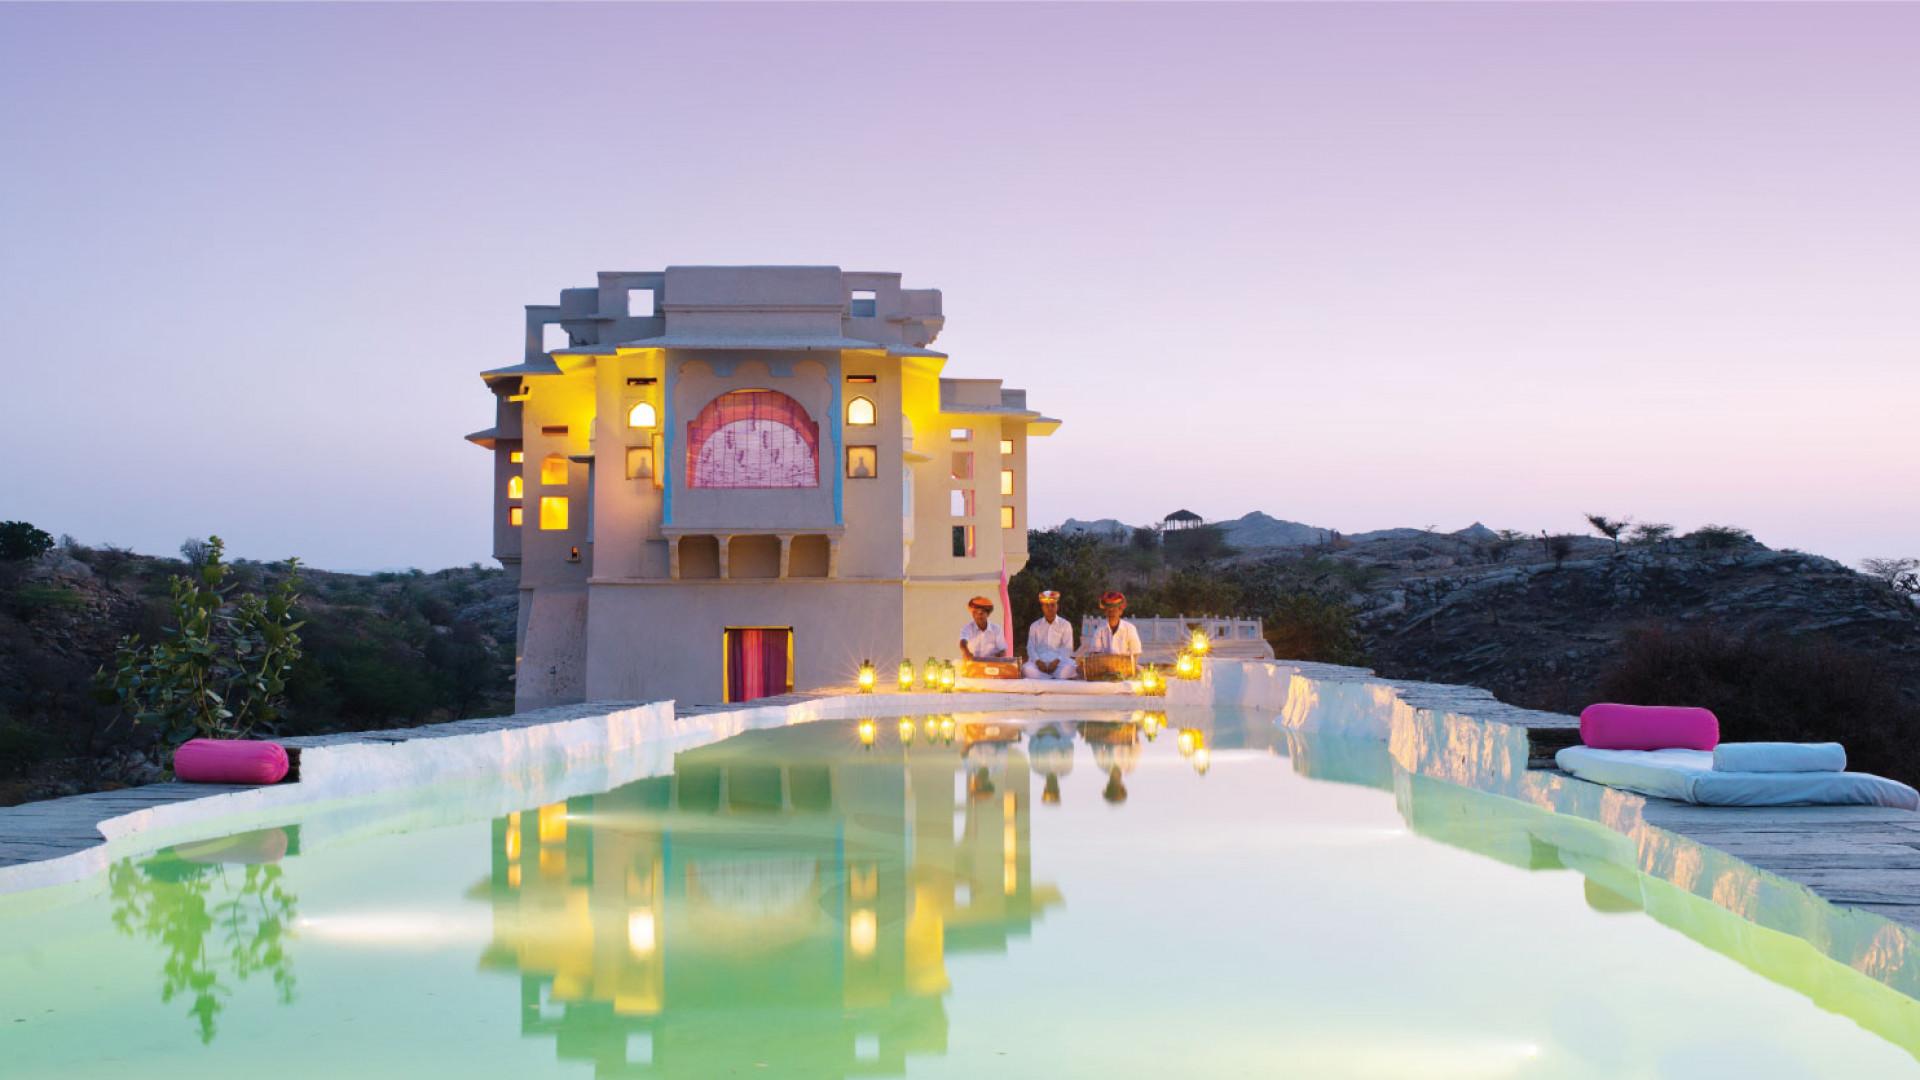 World's Most Awesome Swimming Pools: Lakshman Sagar Resort Rajasthan